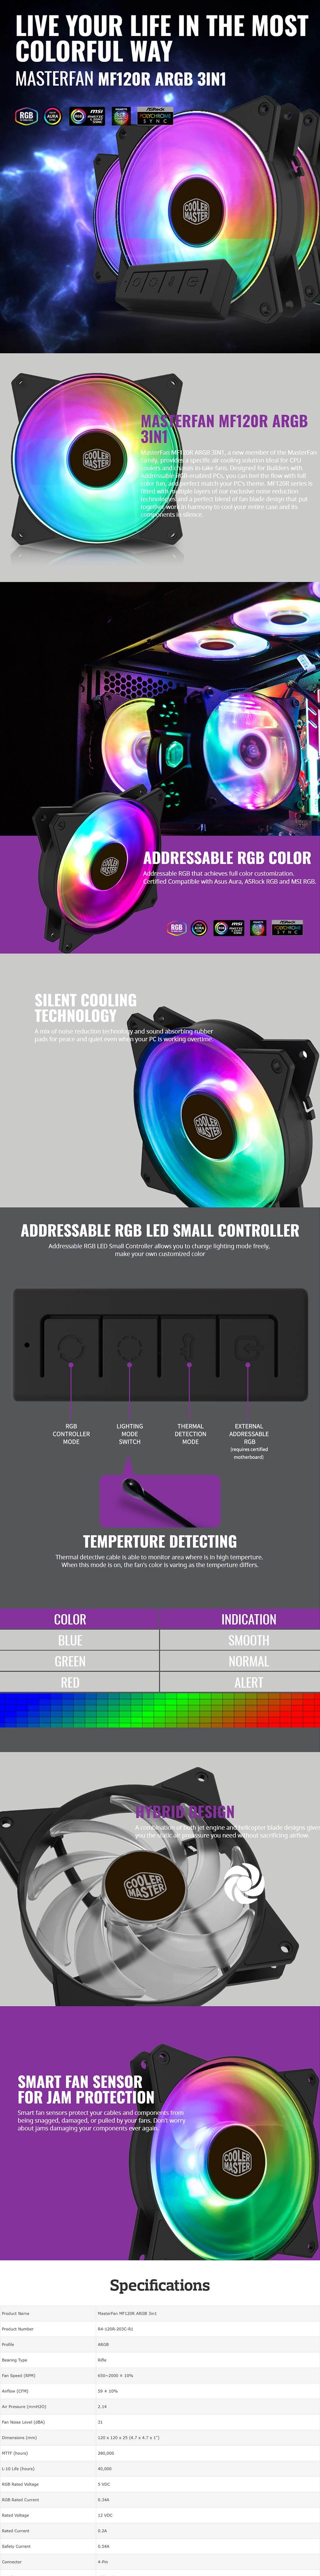 Cooler Master MasterFan MF120R ARGB 120mm Fan - 3 Pack + LED